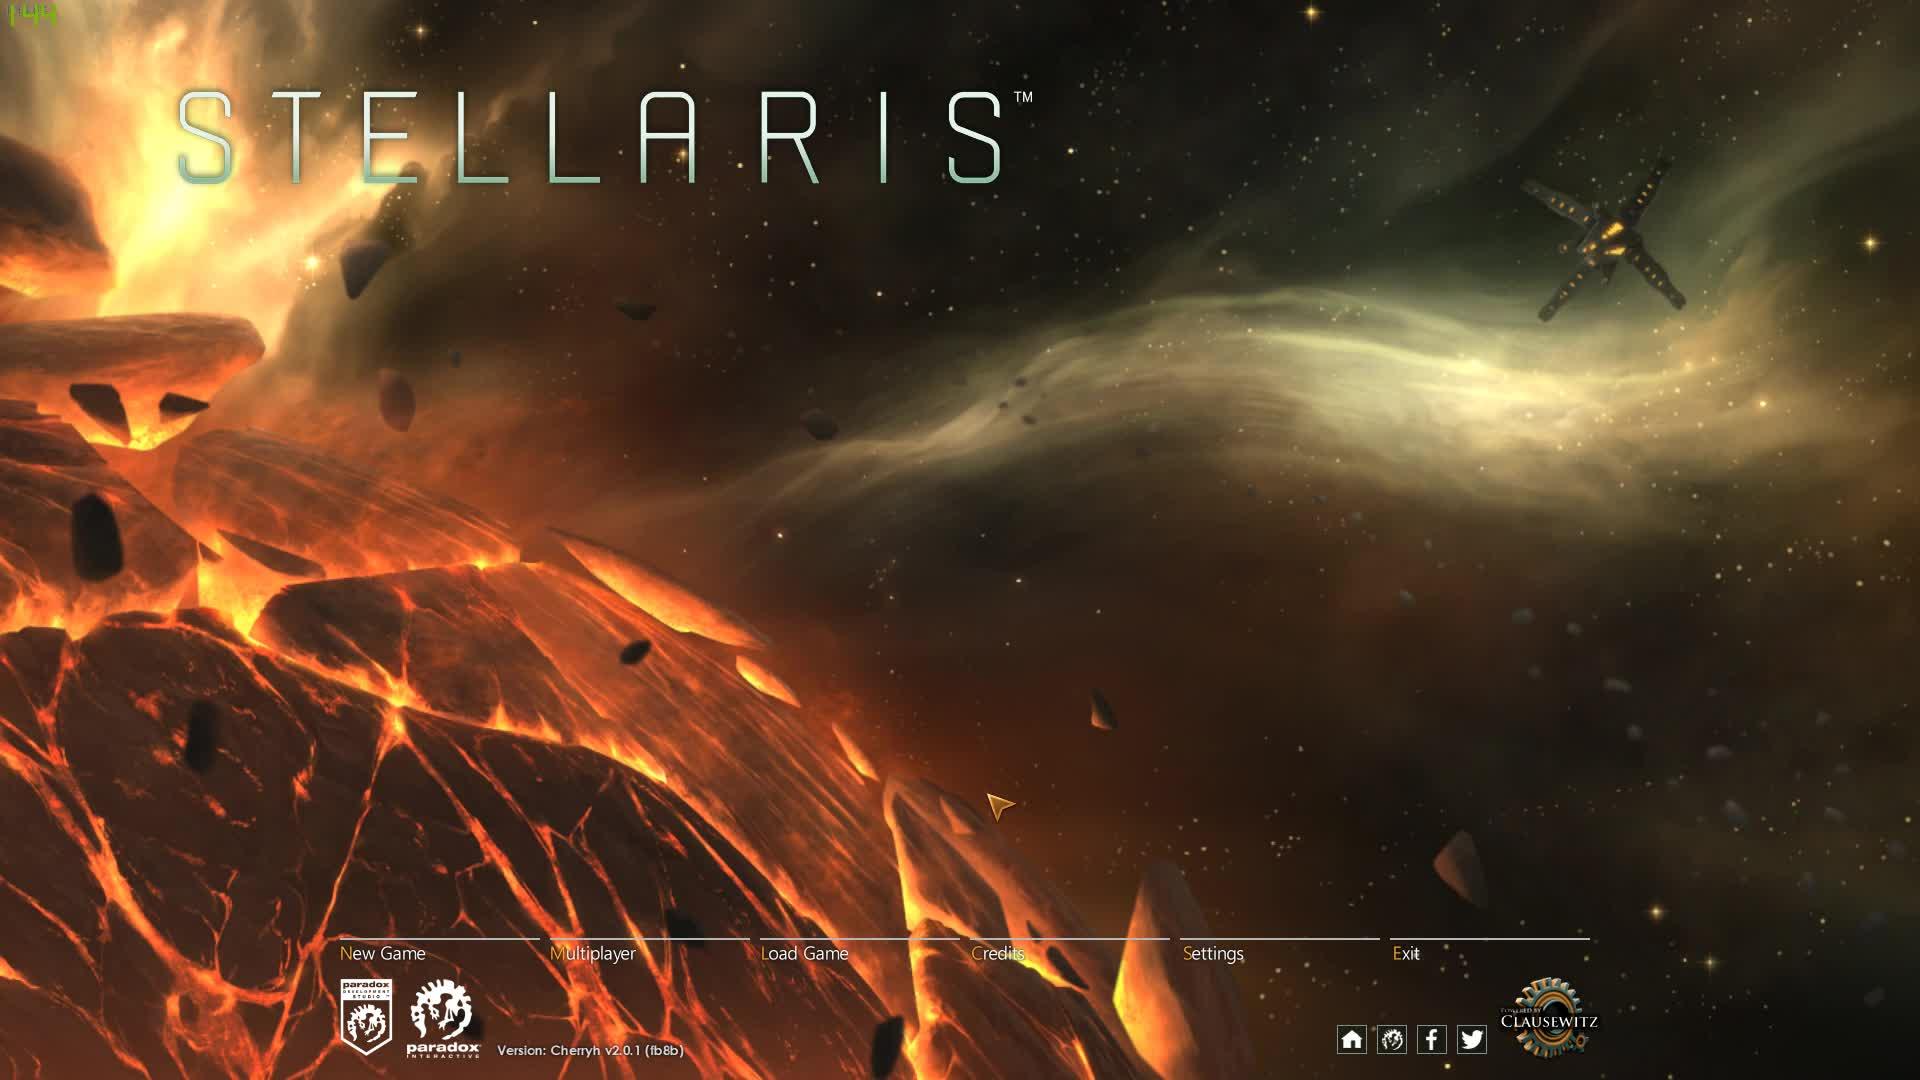 Stellaris 2018.03.03 - 21.42.17.10 GIFs